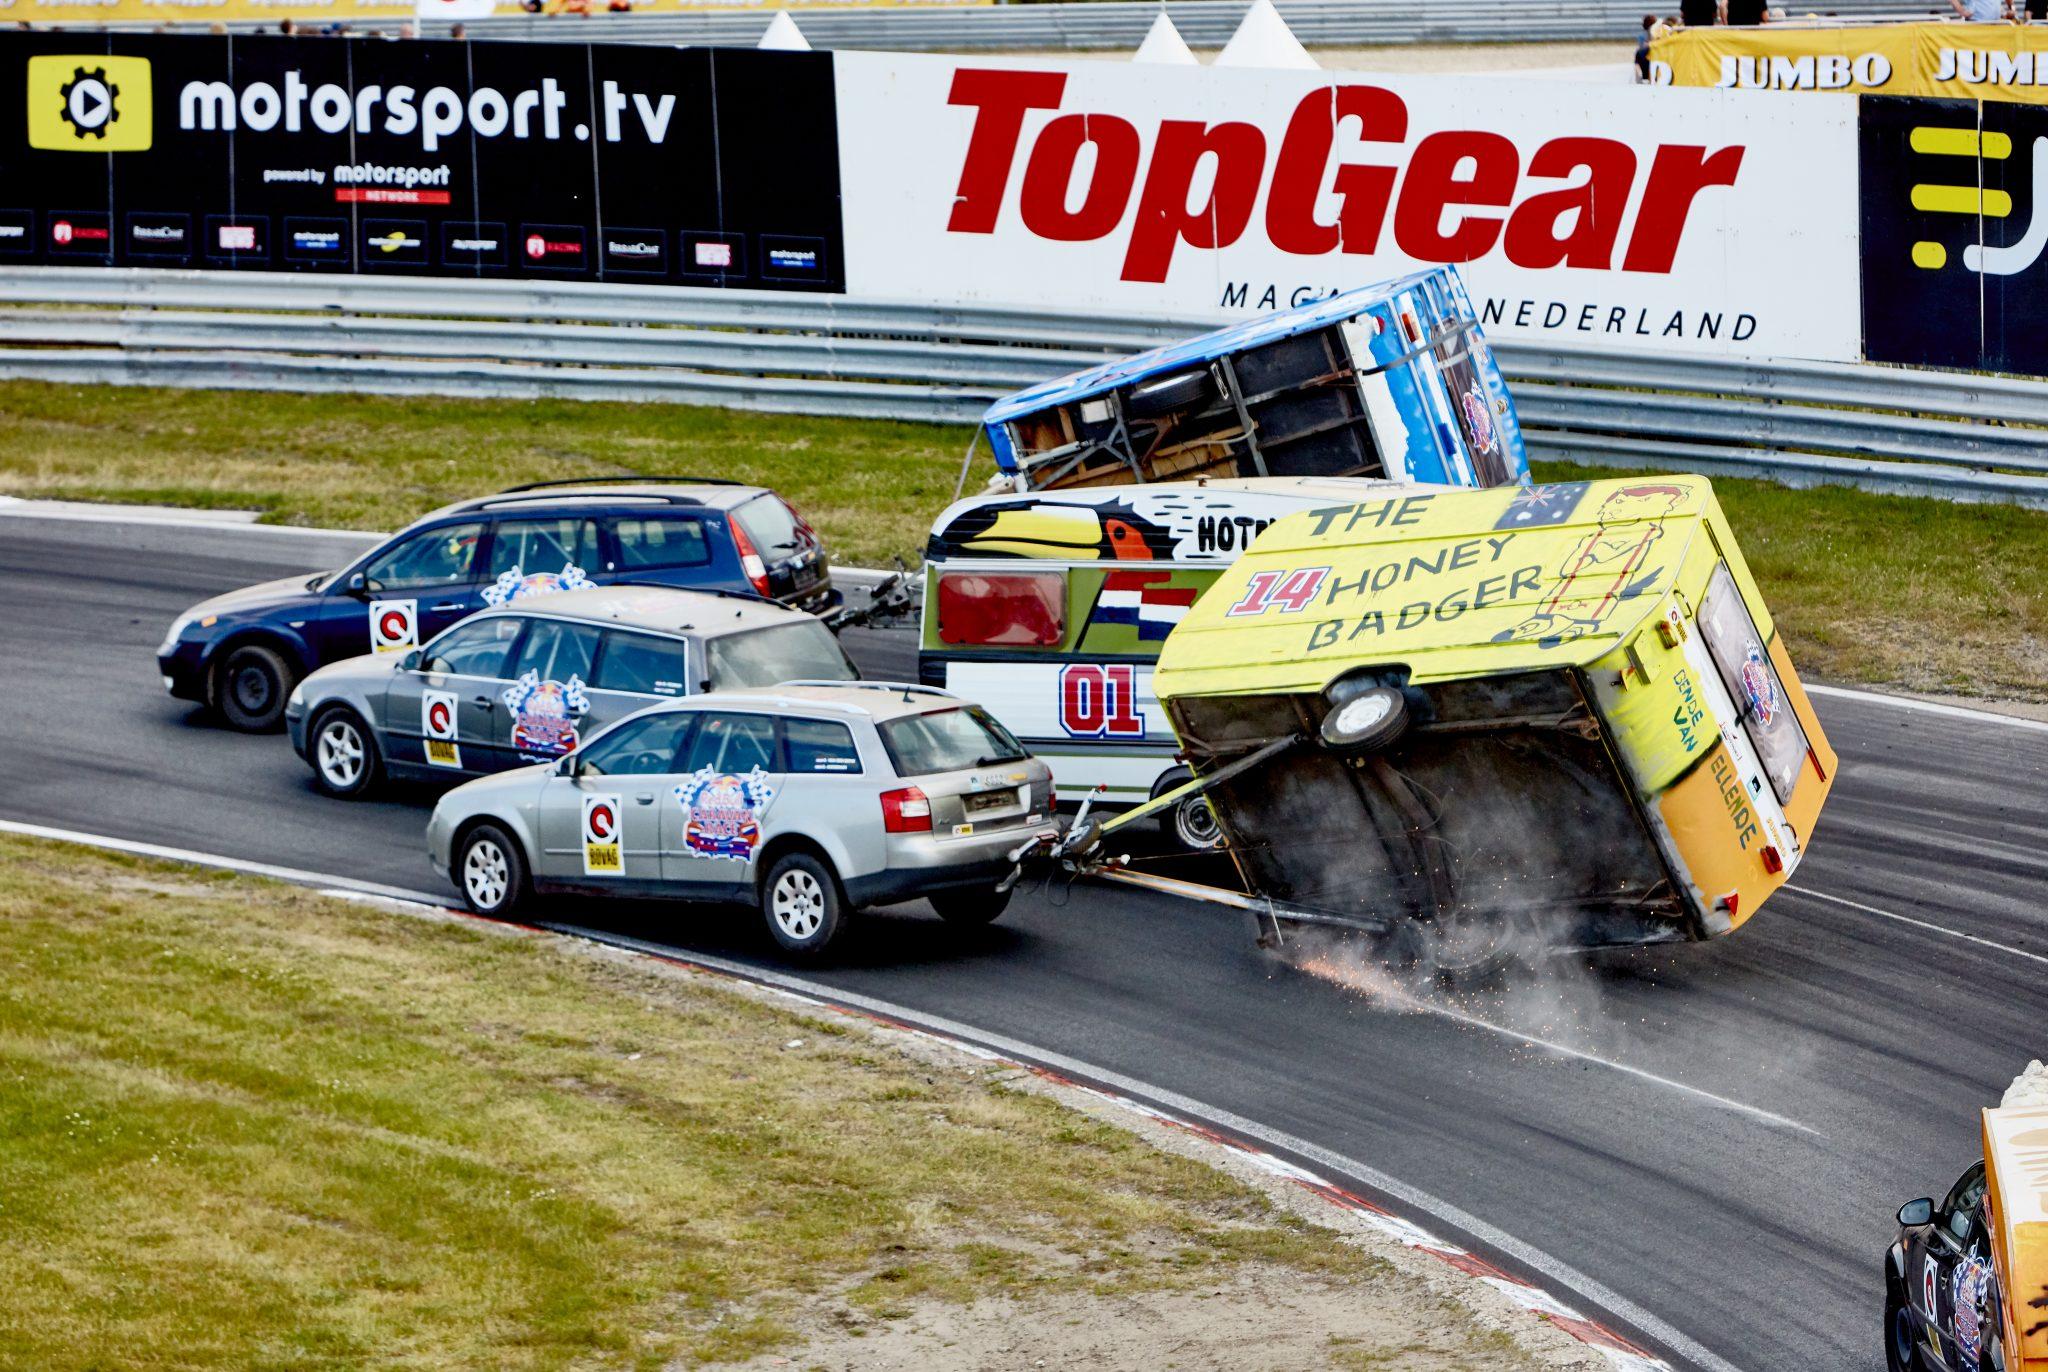 Max Jumbo Raceday in Zandvoort TopGear